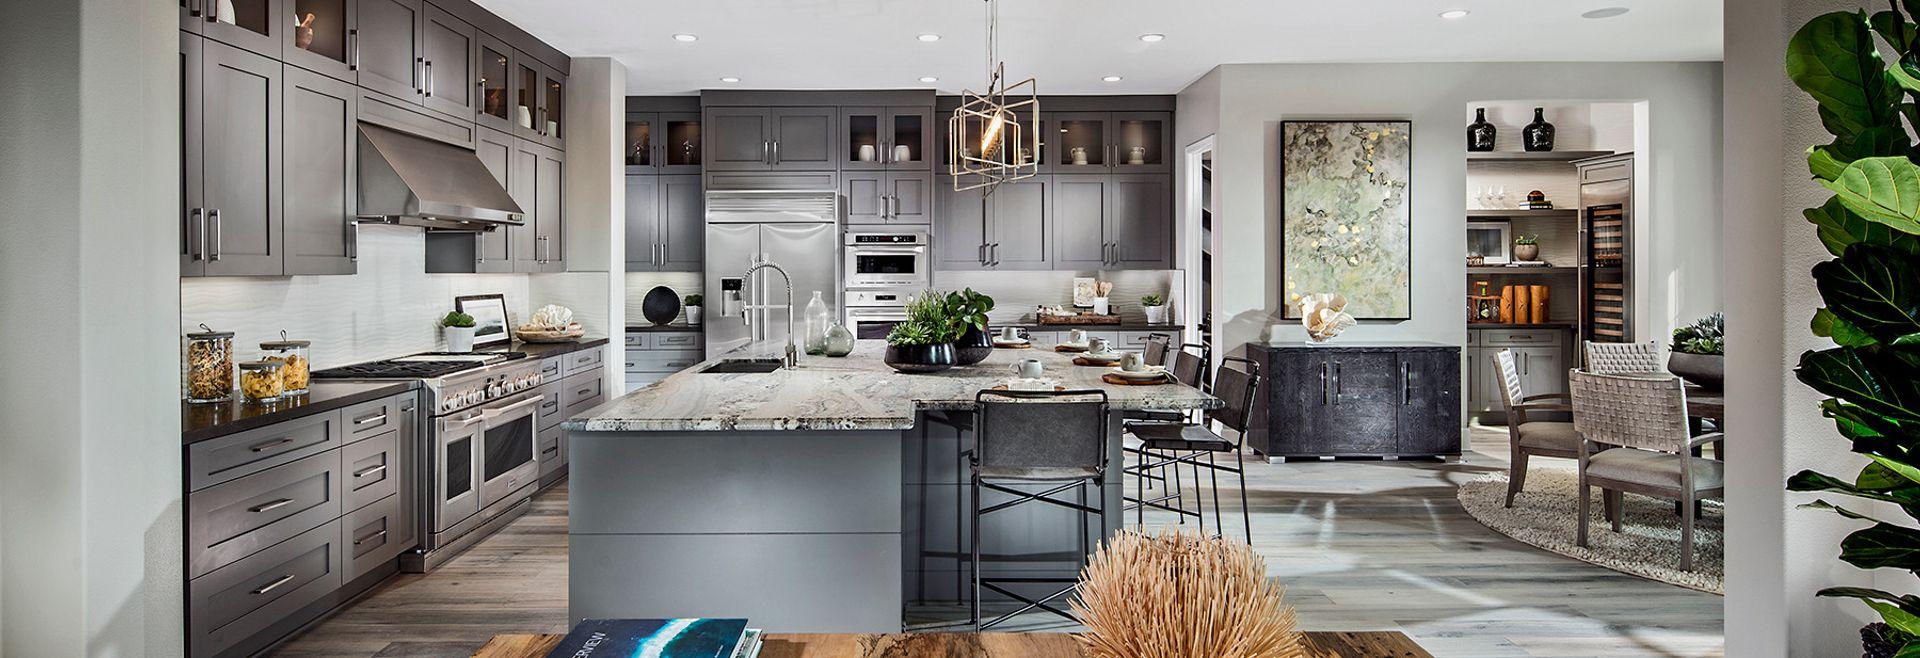 Parkside Estates Plan 3 Kitchen